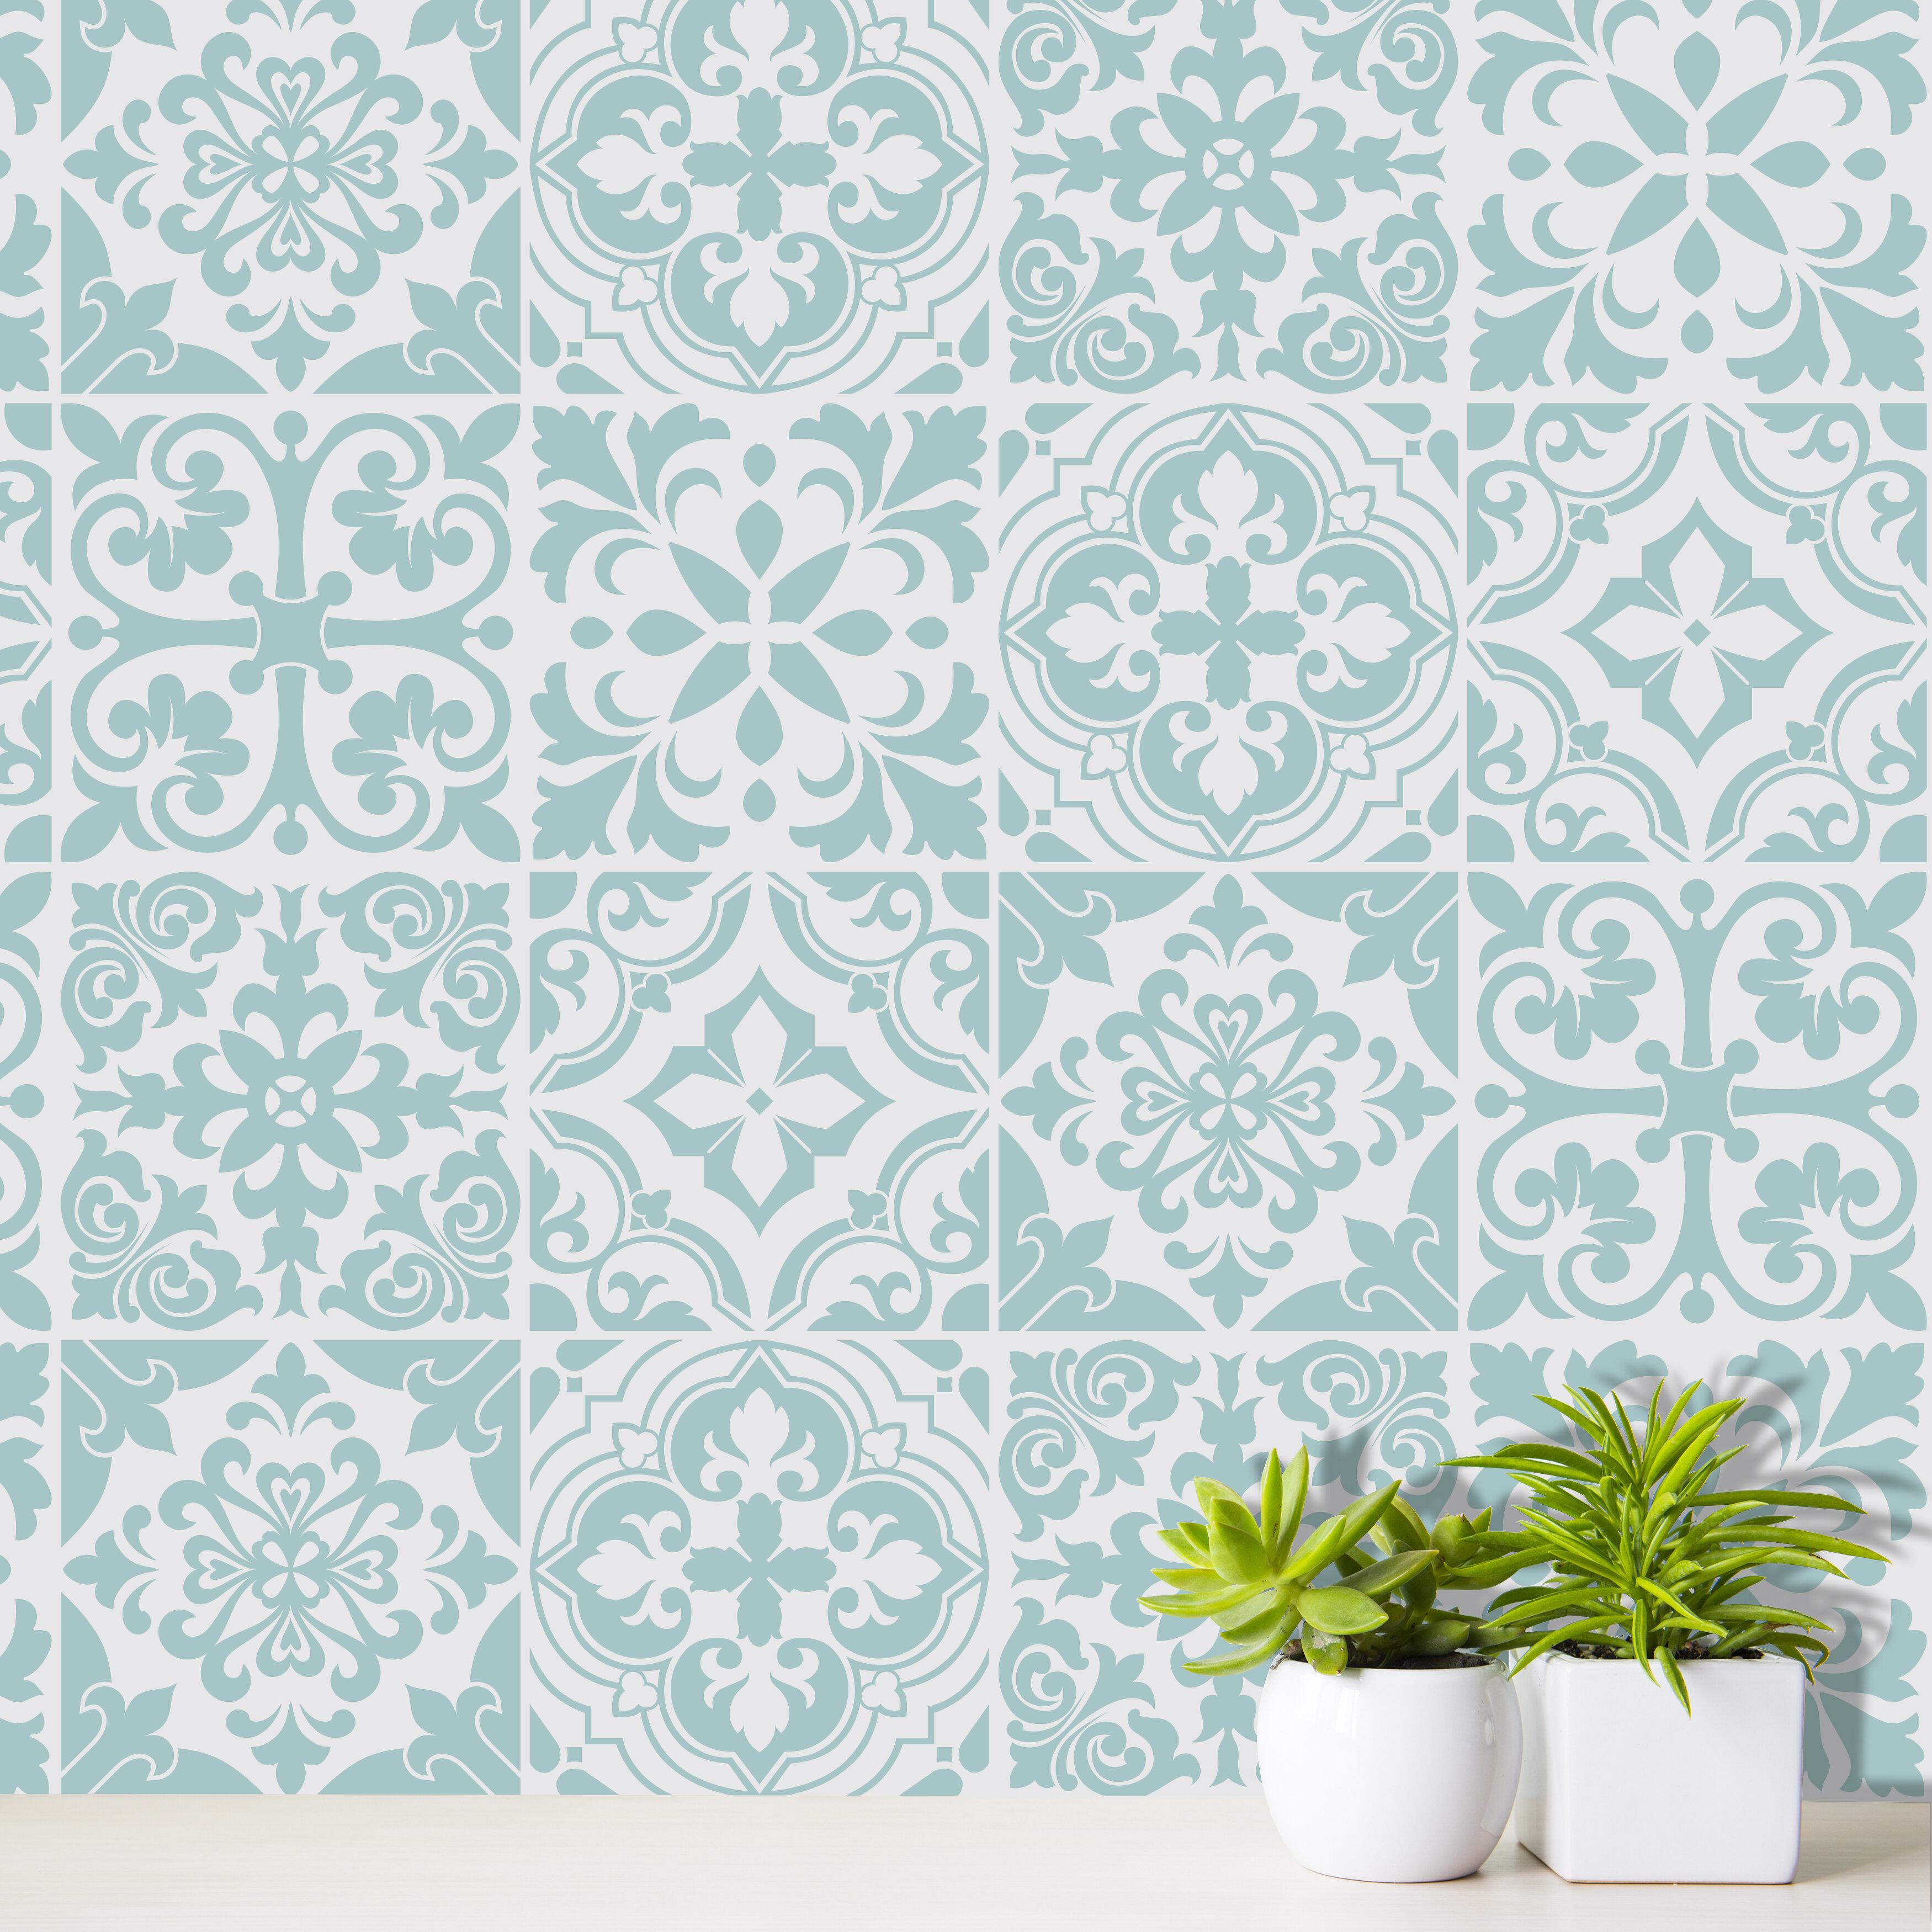 Stencil Tile Window Decal Set